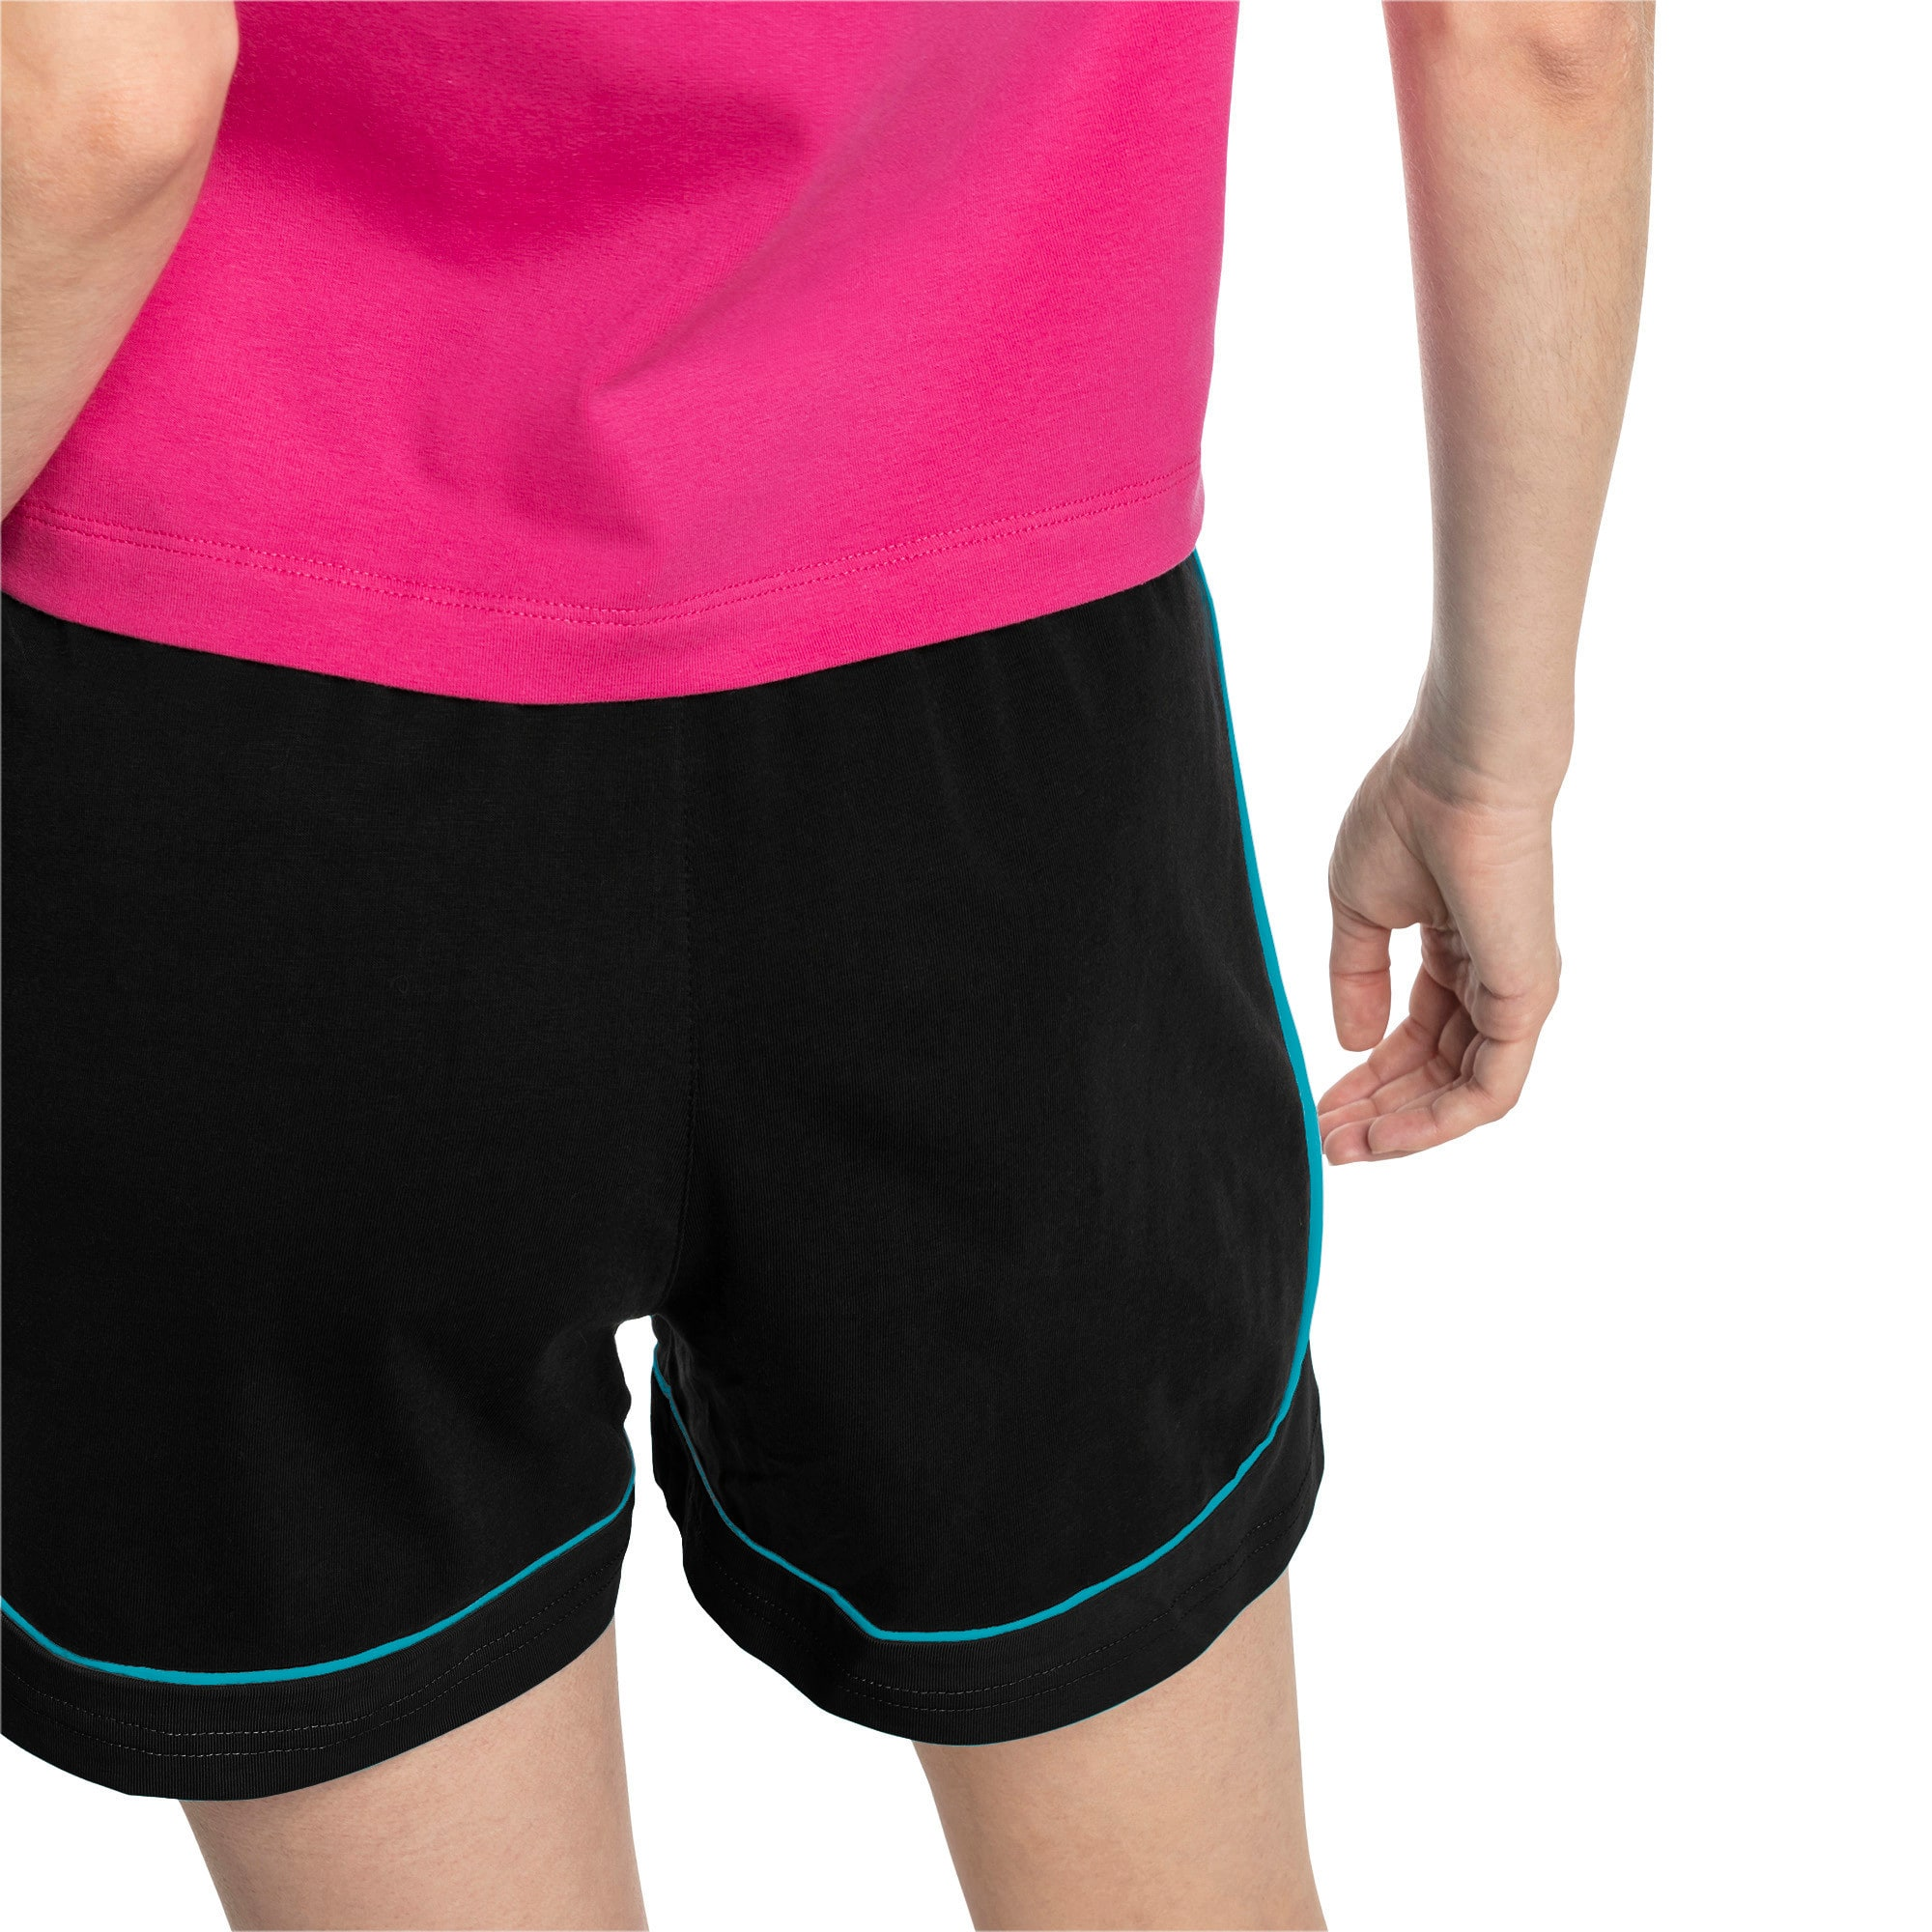 Thumbnail 2 of Chase Women's Shorts, Cotton Black-Caribbean Sea, medium